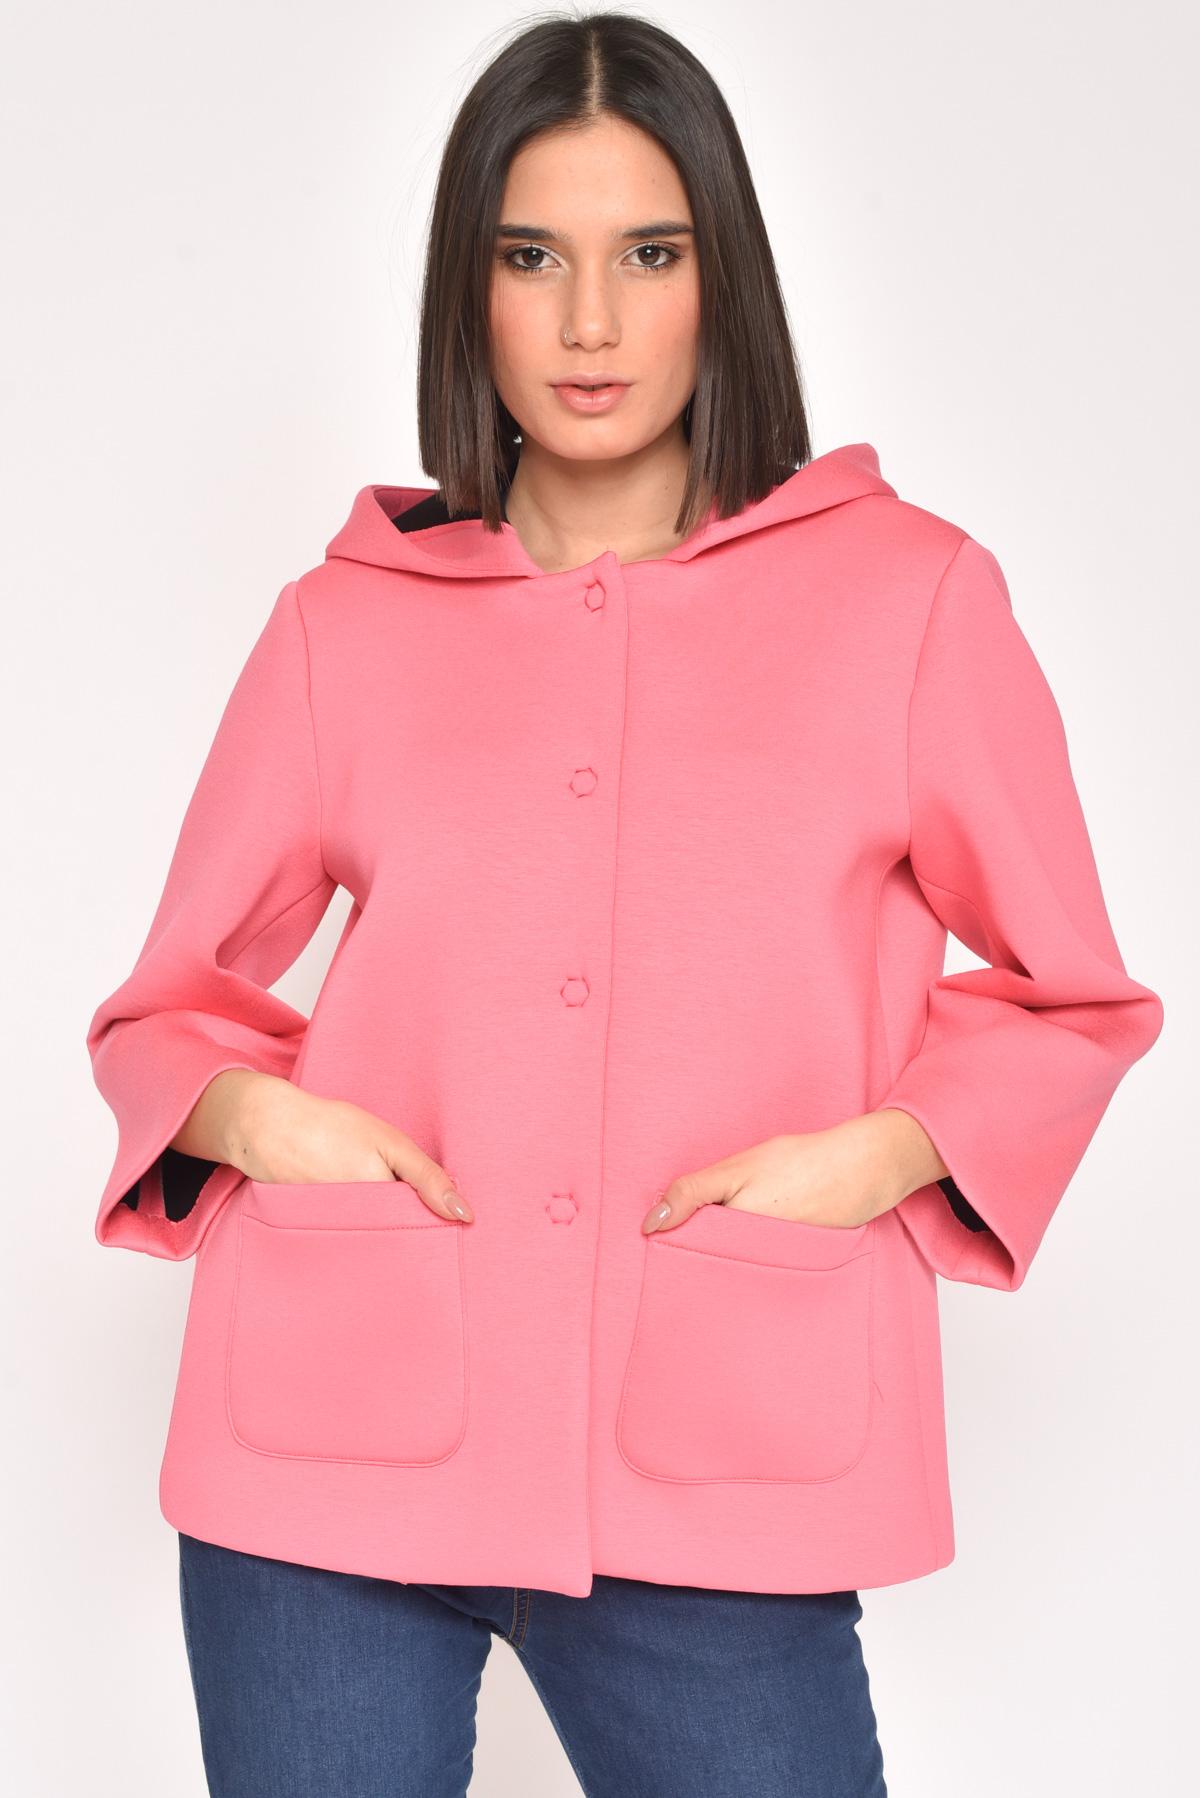 GIACCA OVERSIZED IN SCUBA for women - FUCHSIA - Paquito Pronto Moda Shop Online